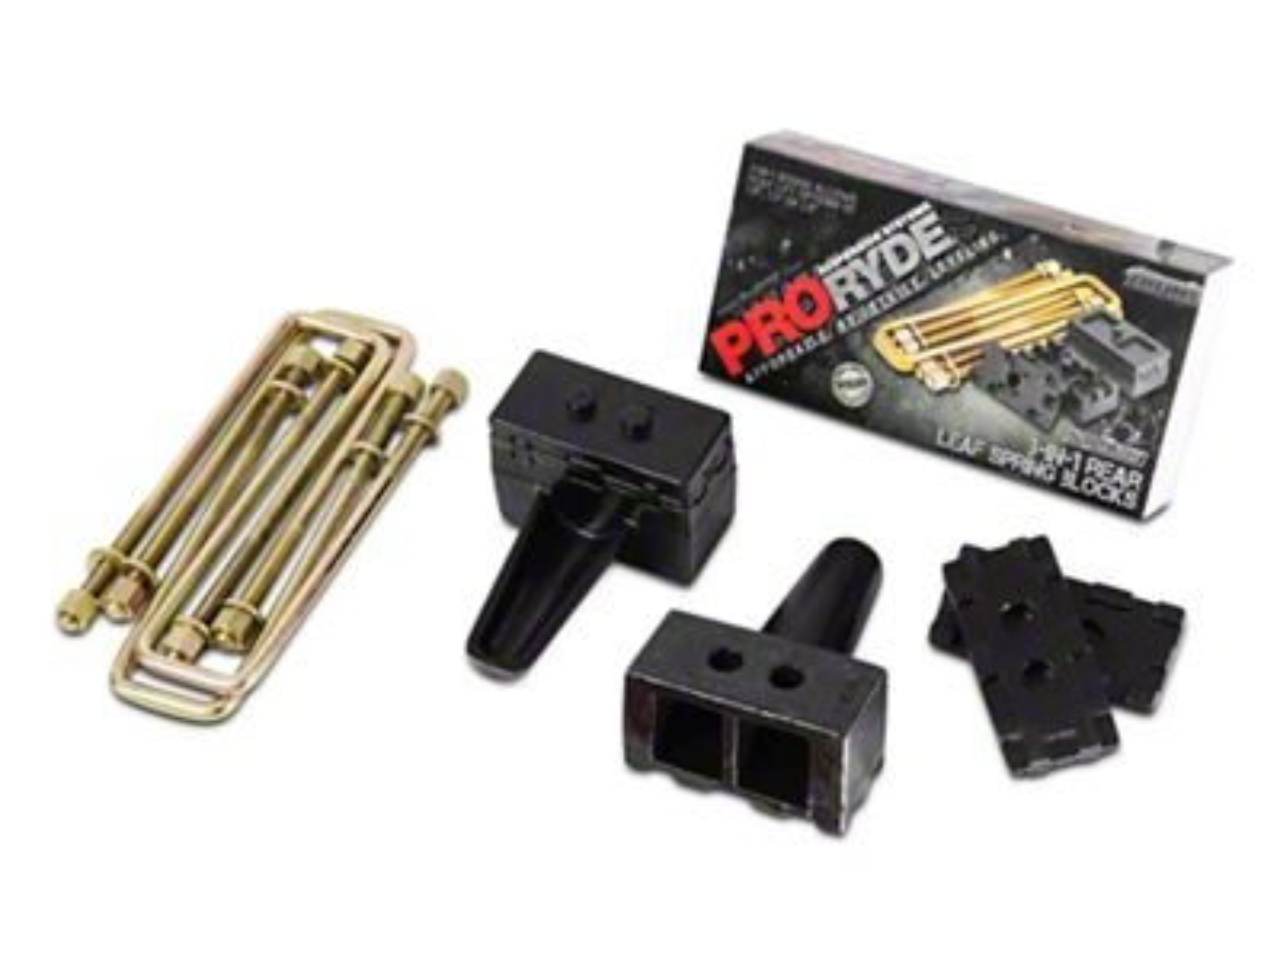 ProRYDE 3-in-1 Adjustable Rear Lift Block Kit (04-19 4WD F-150)